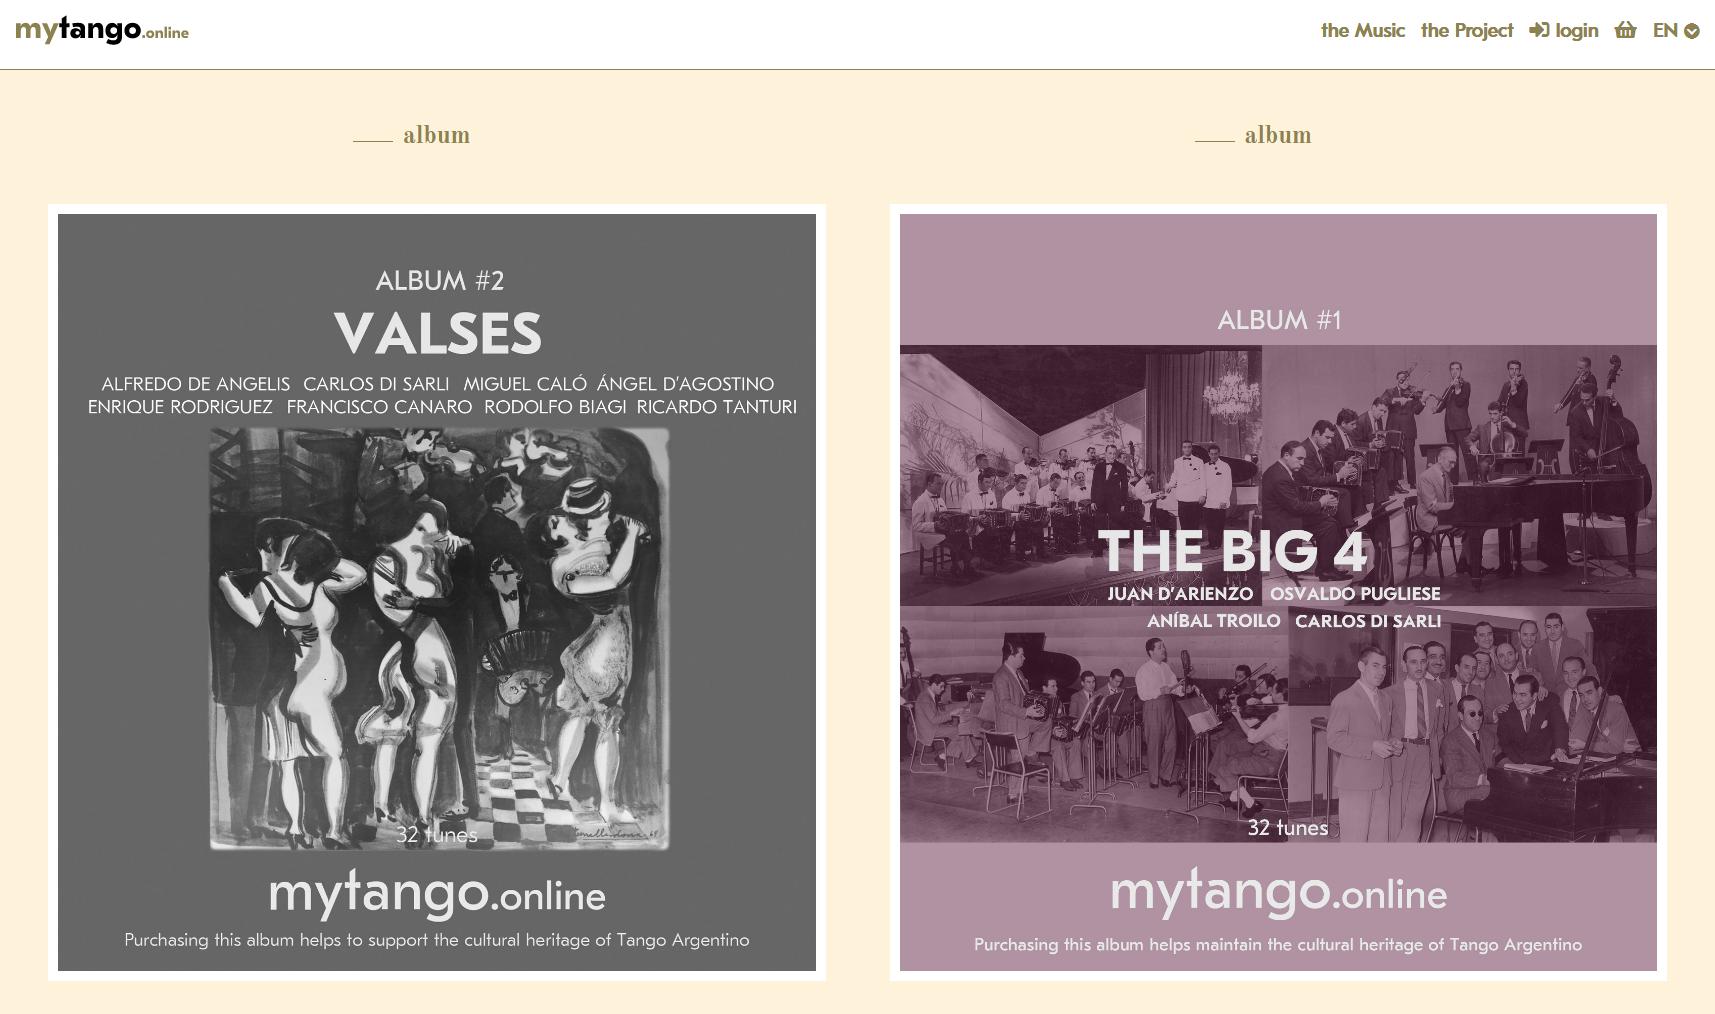 myTango.online